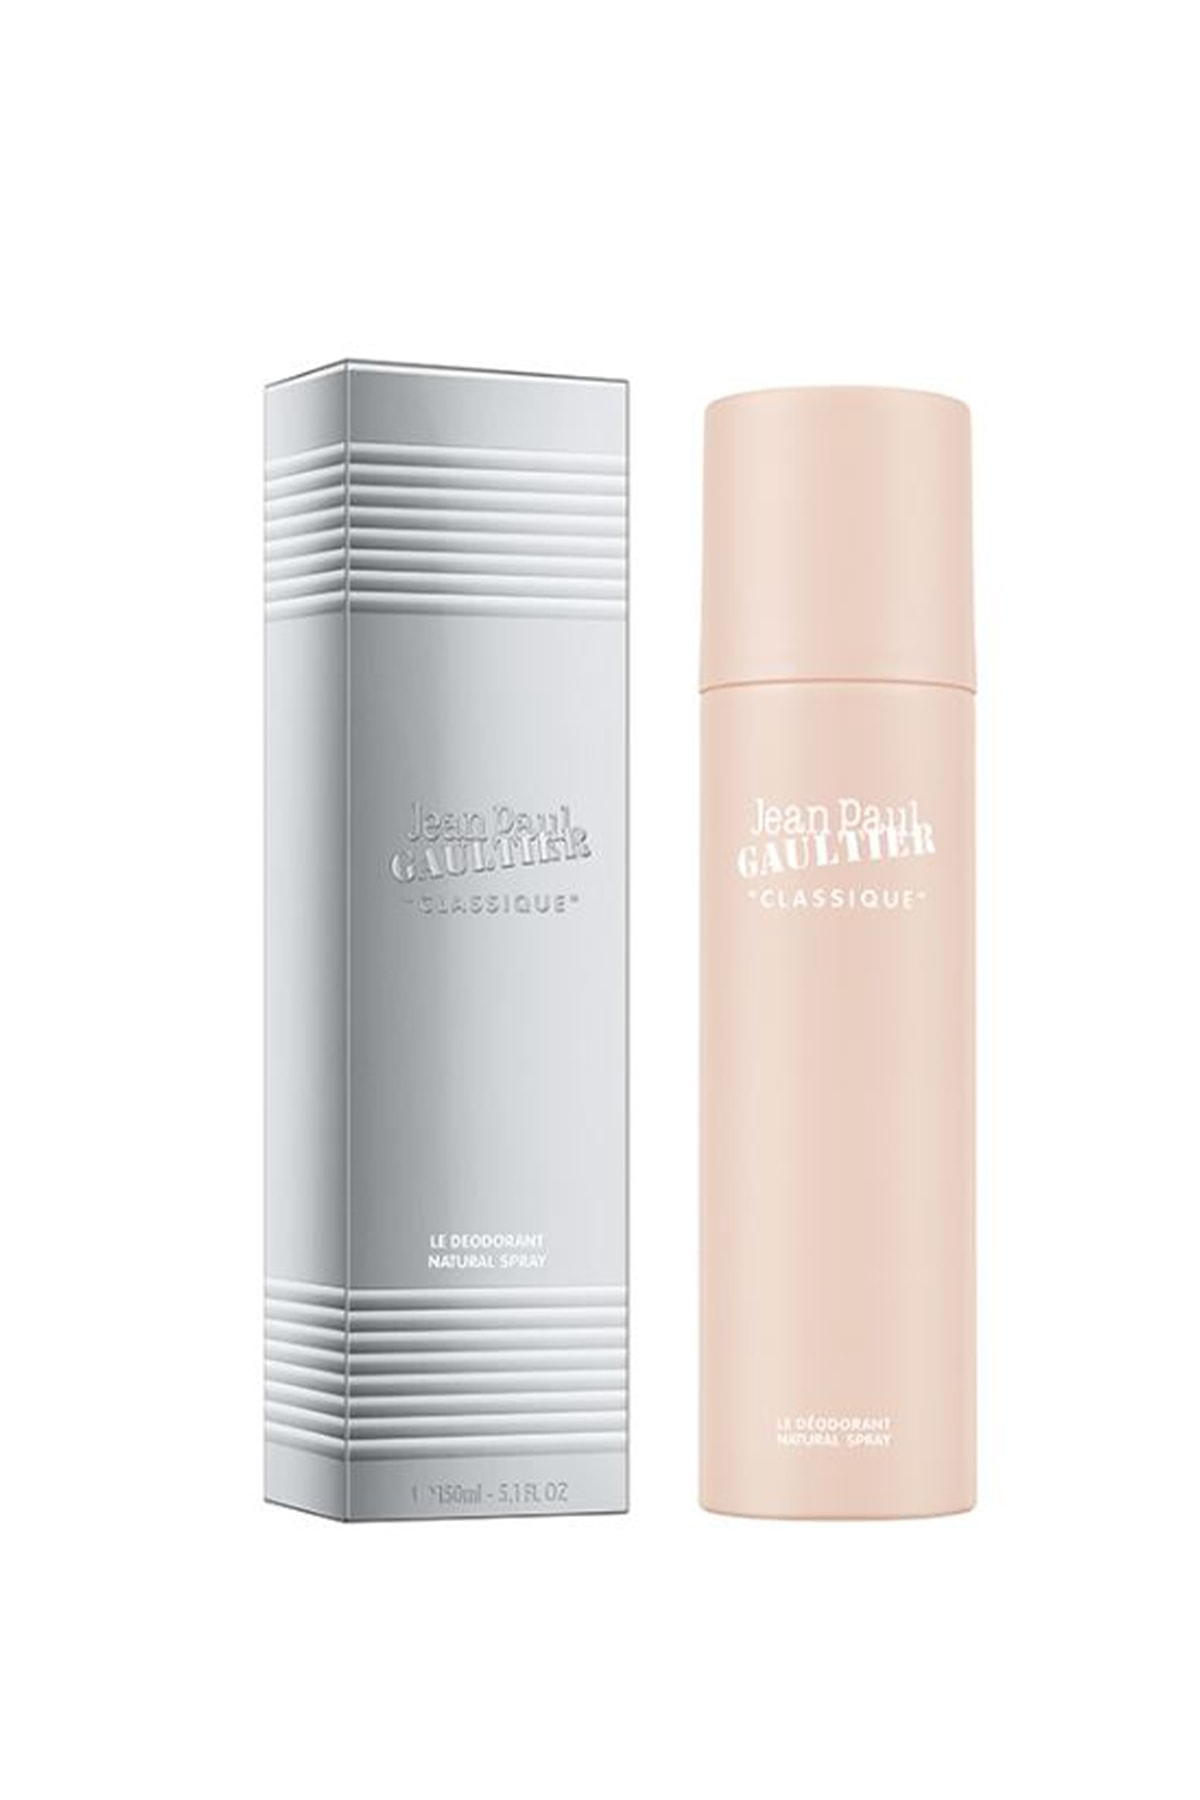 Jean Paul Gaultier Classique For Women Deodorant 150 ml 8435415011433